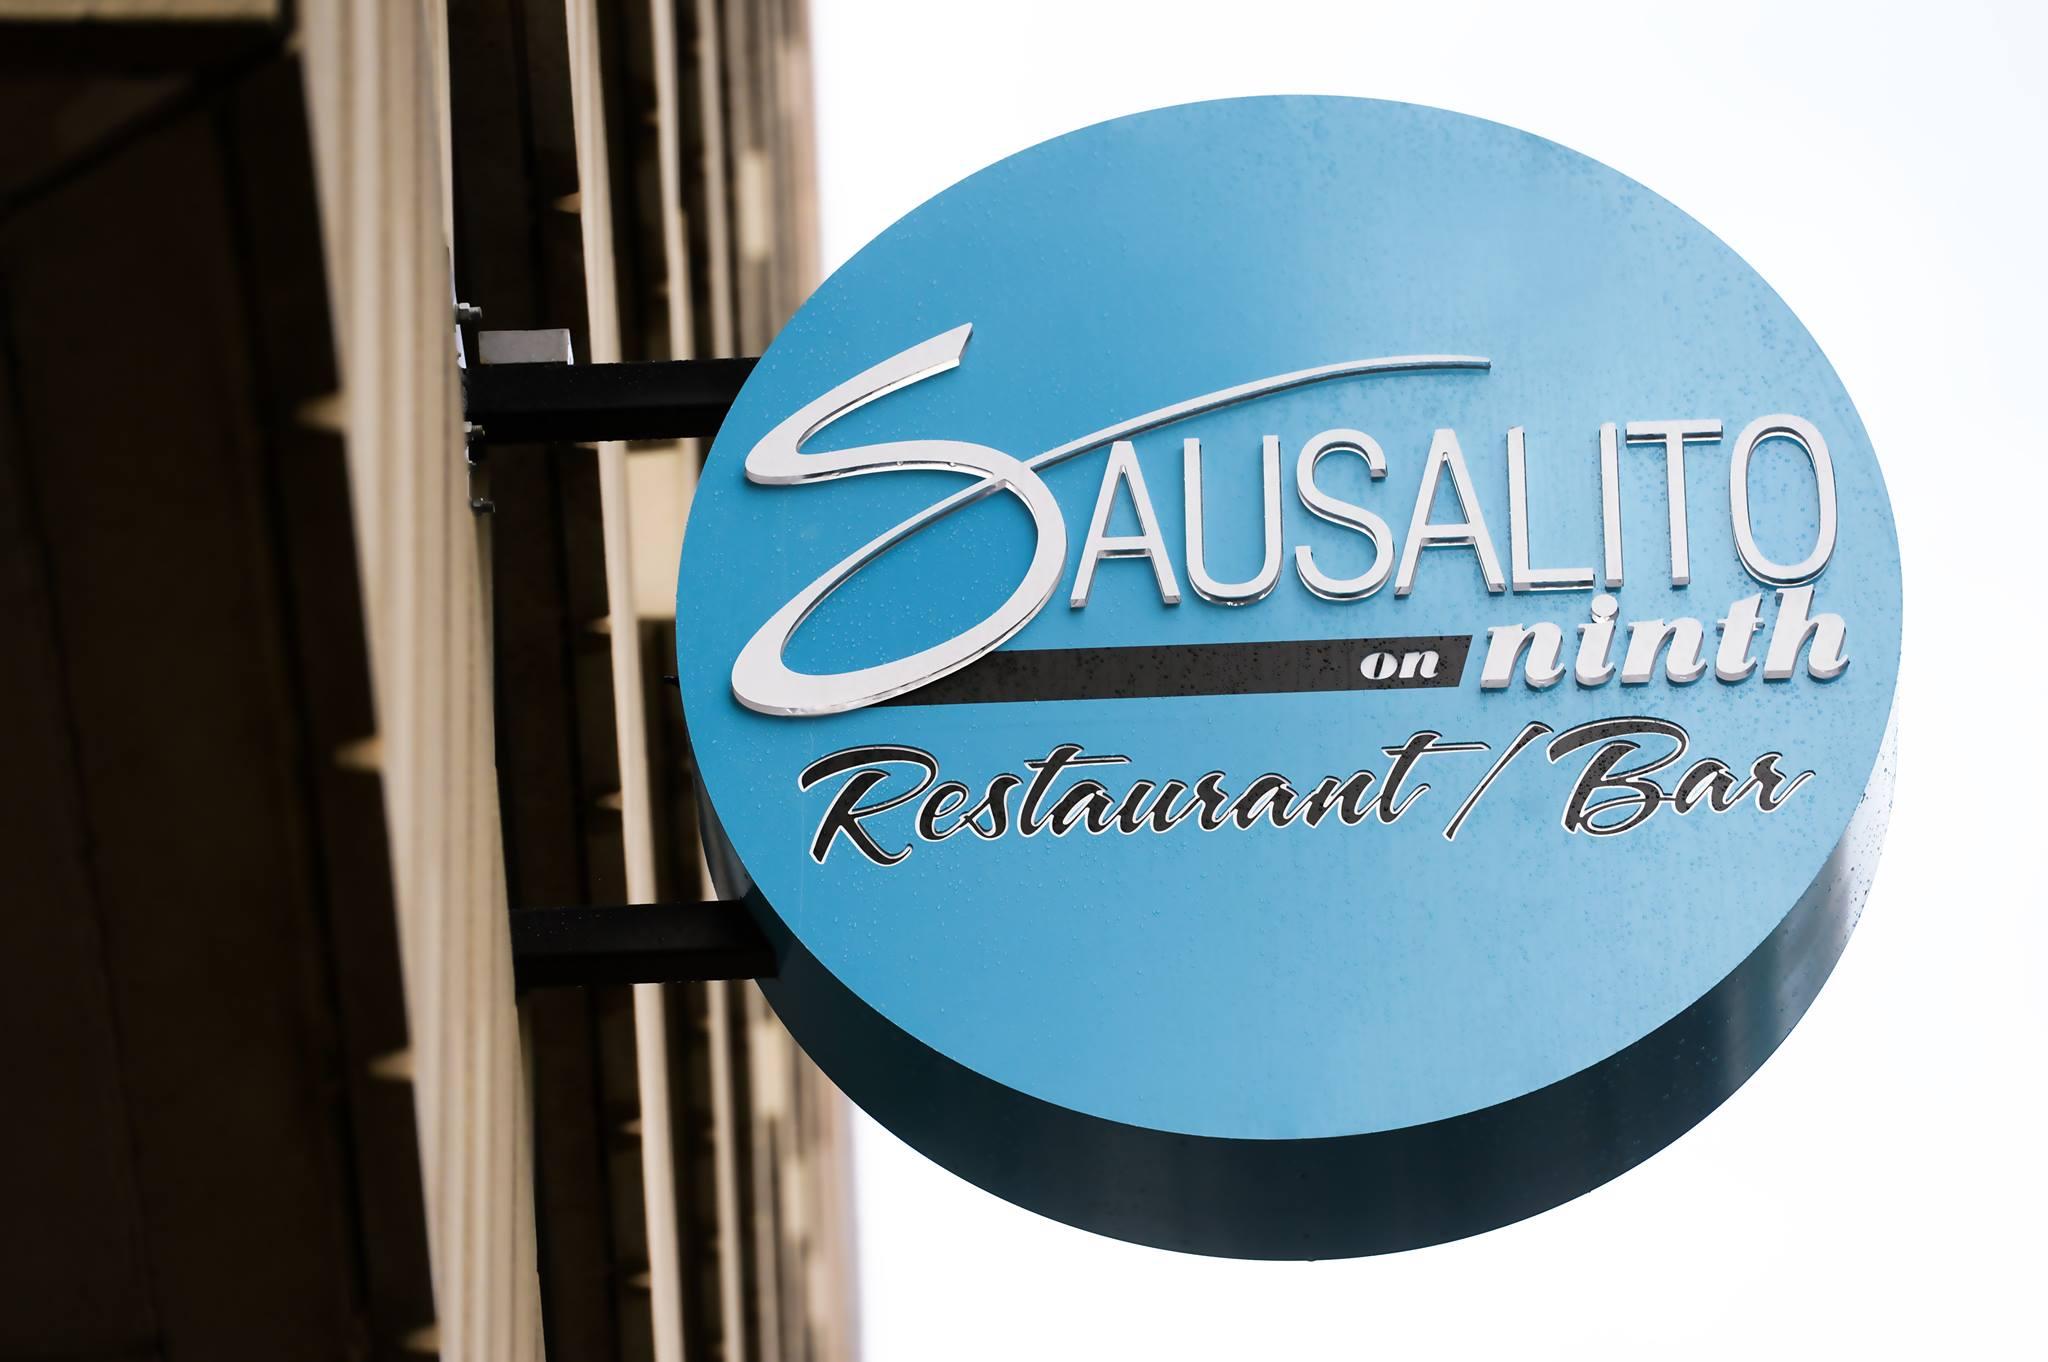 Restaurant + Bar